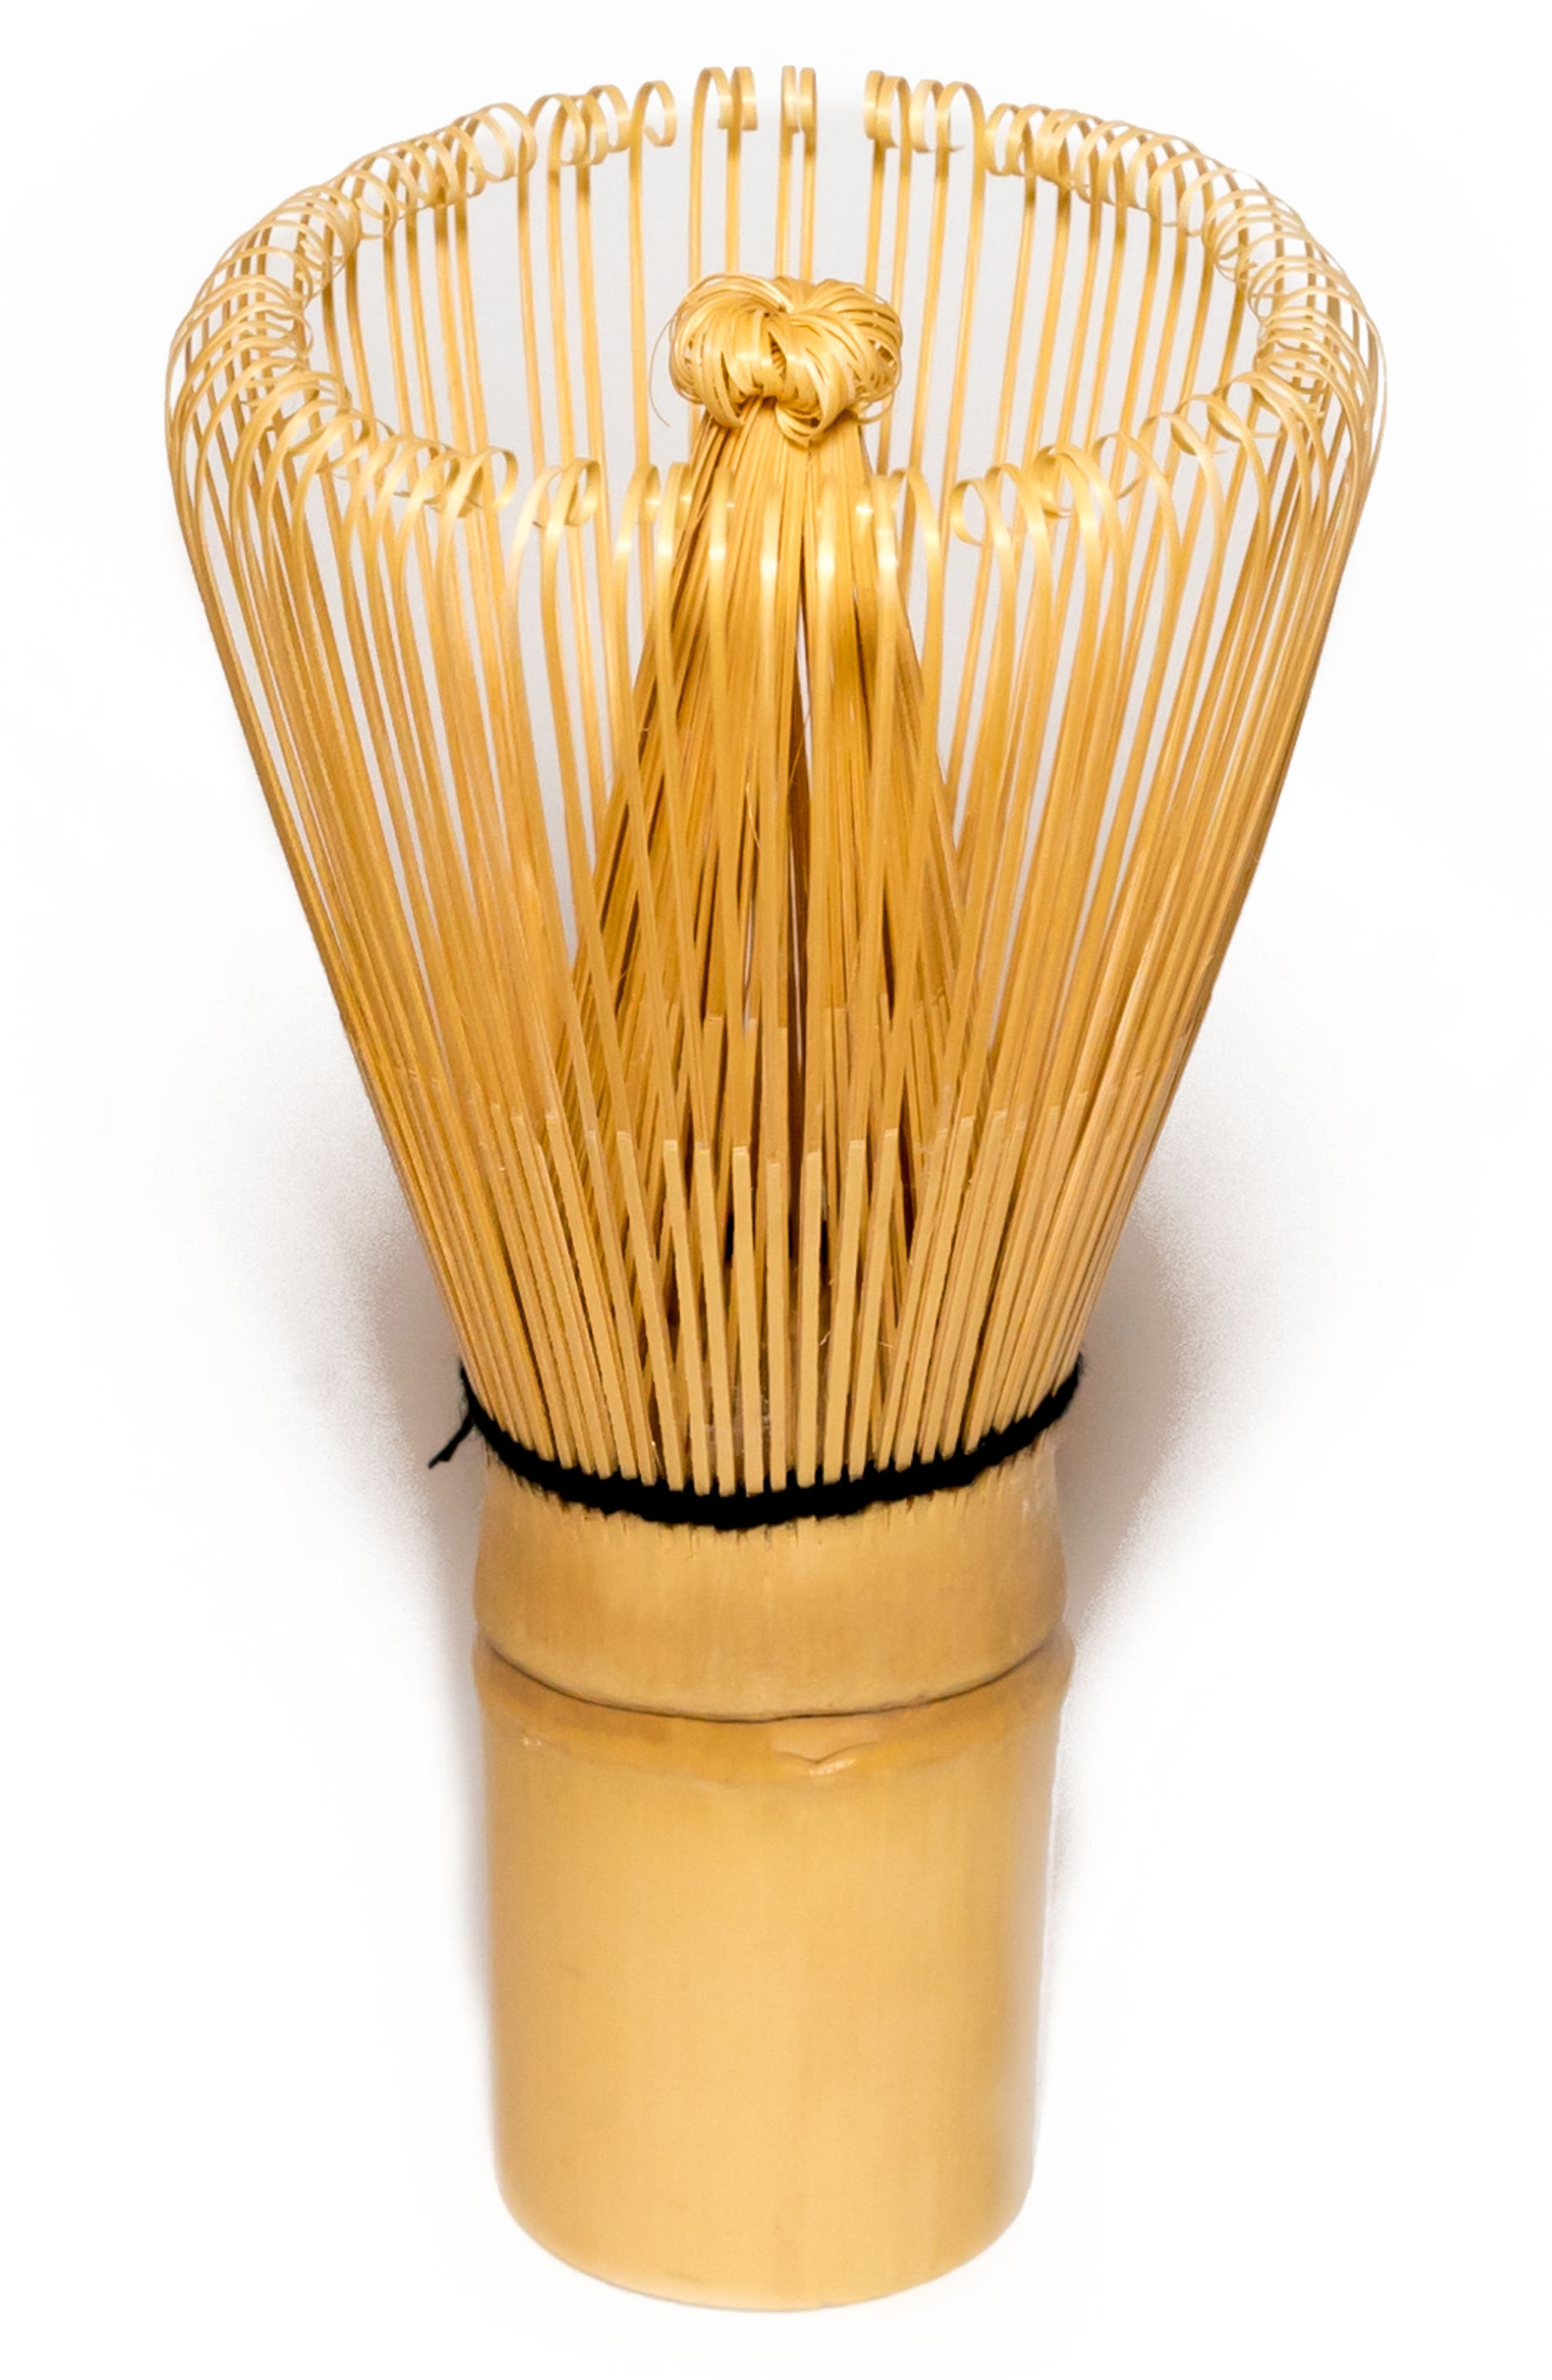 Alternate Image 1 Selected - Chalait 100 Prong Bamboo Matcha Whisk